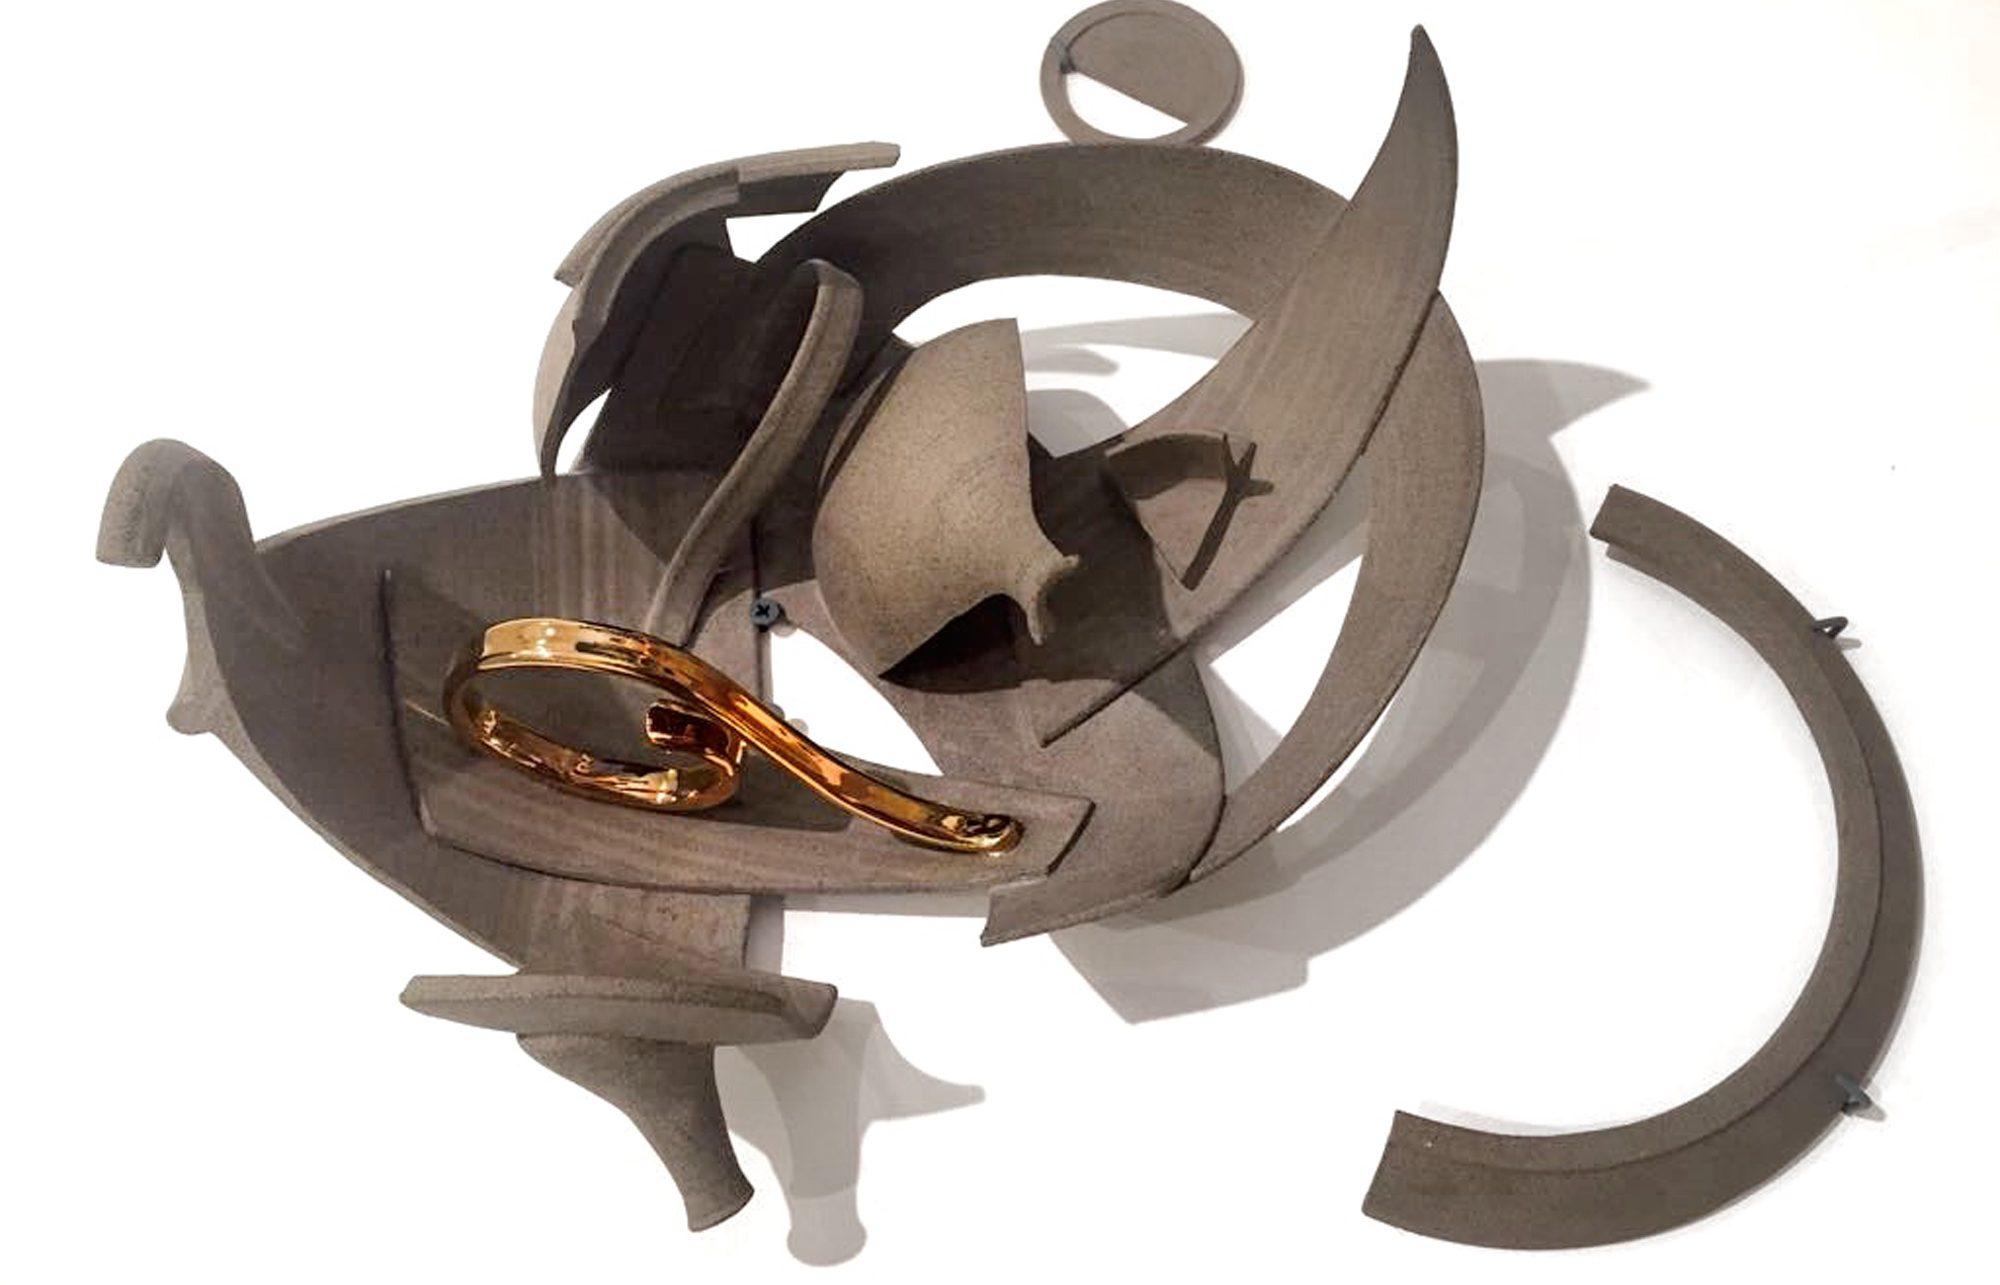 Intermediated Wheel Throwing / Wheel Thrown toSculptural Object / Dikla Moskovitz